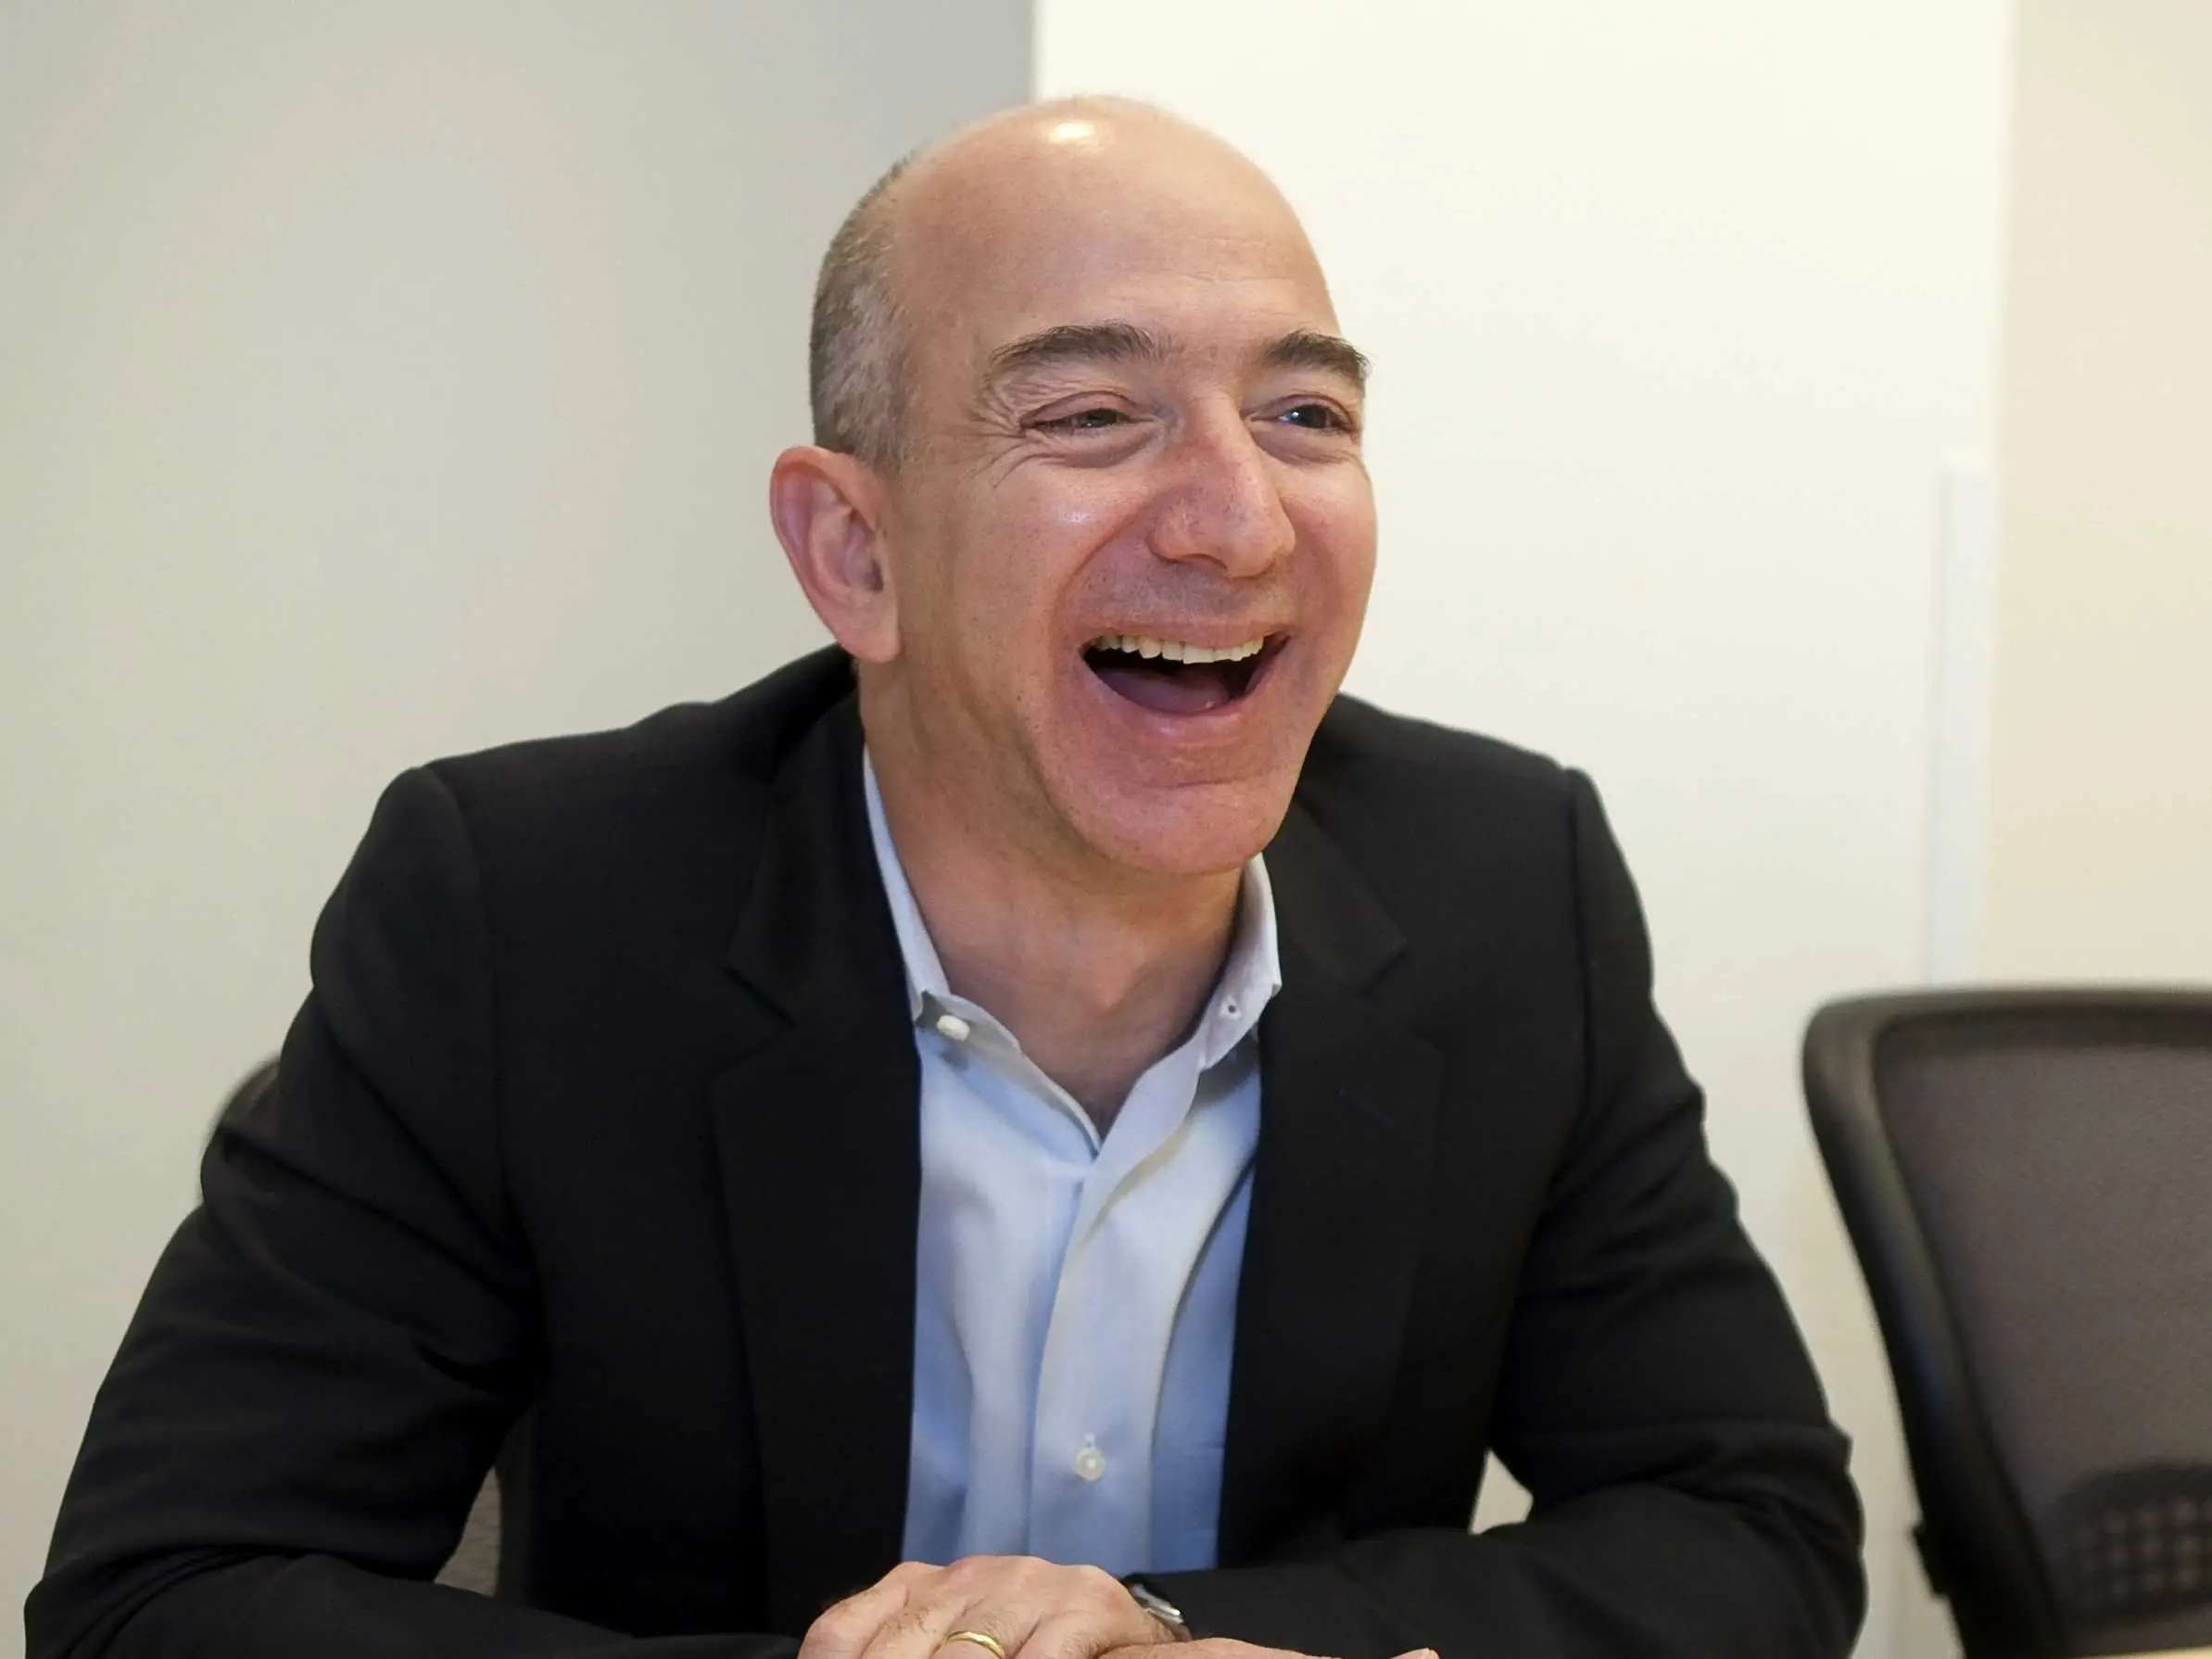 Amazon CEO Jeff Bezos likes to get people arguing.